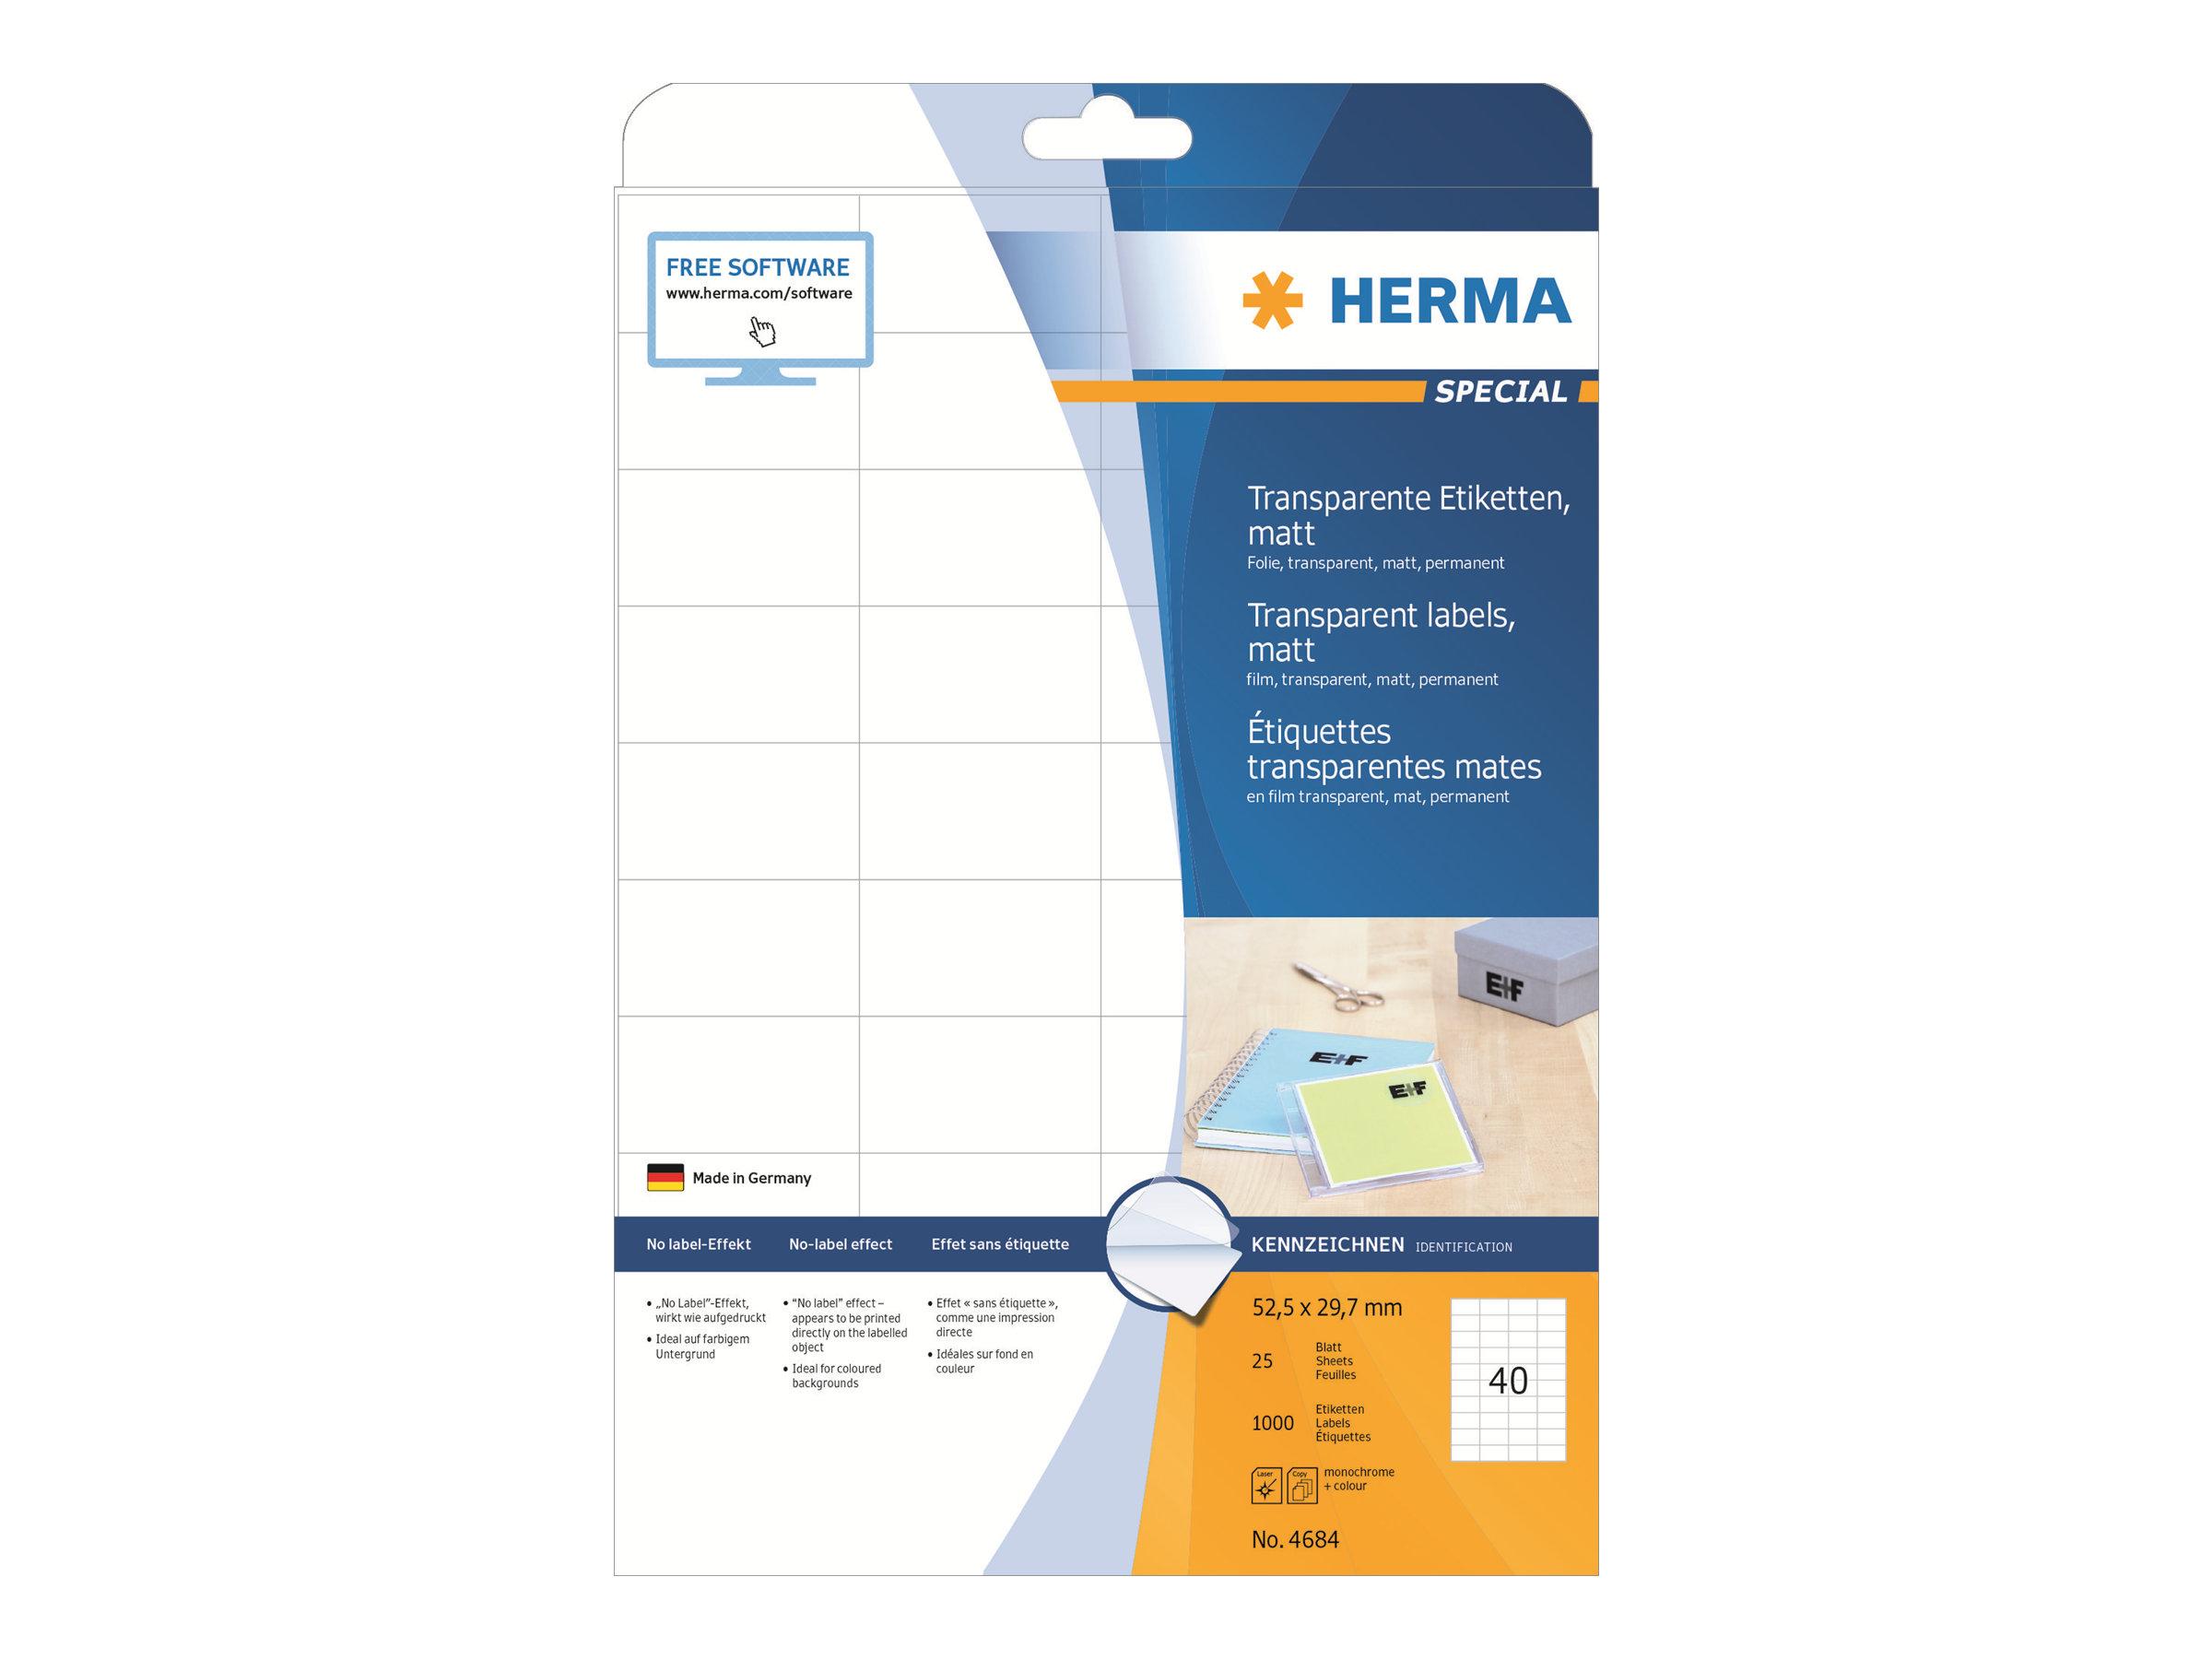 HERMA Special - Matt - permanent selbstklebend